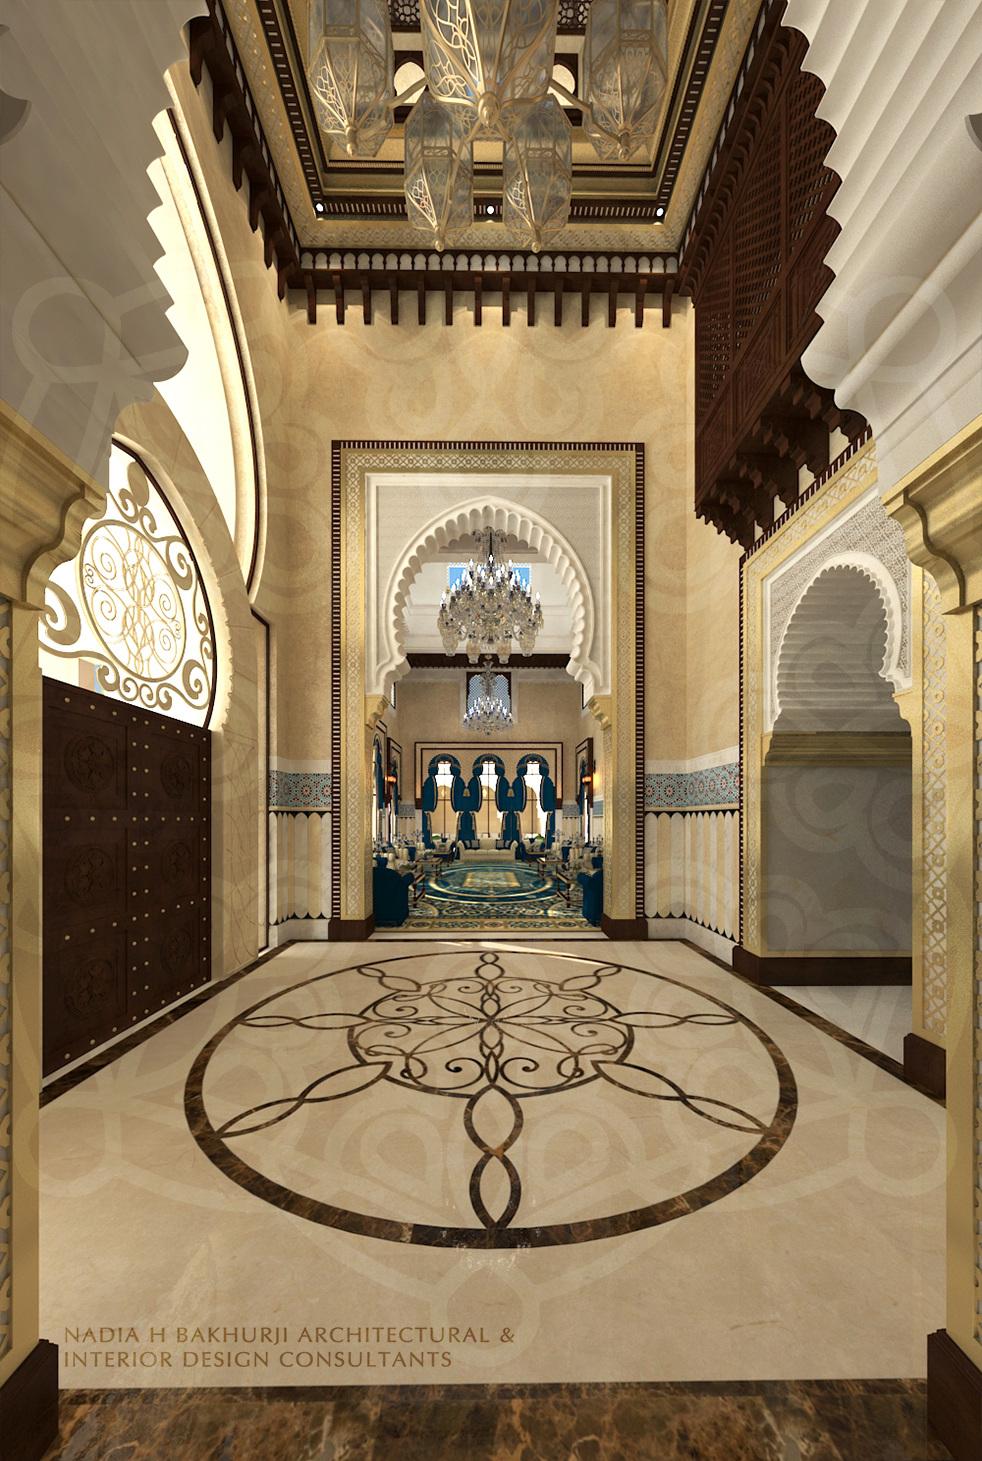 Nadia H Bakhurji Architects & Interior Design